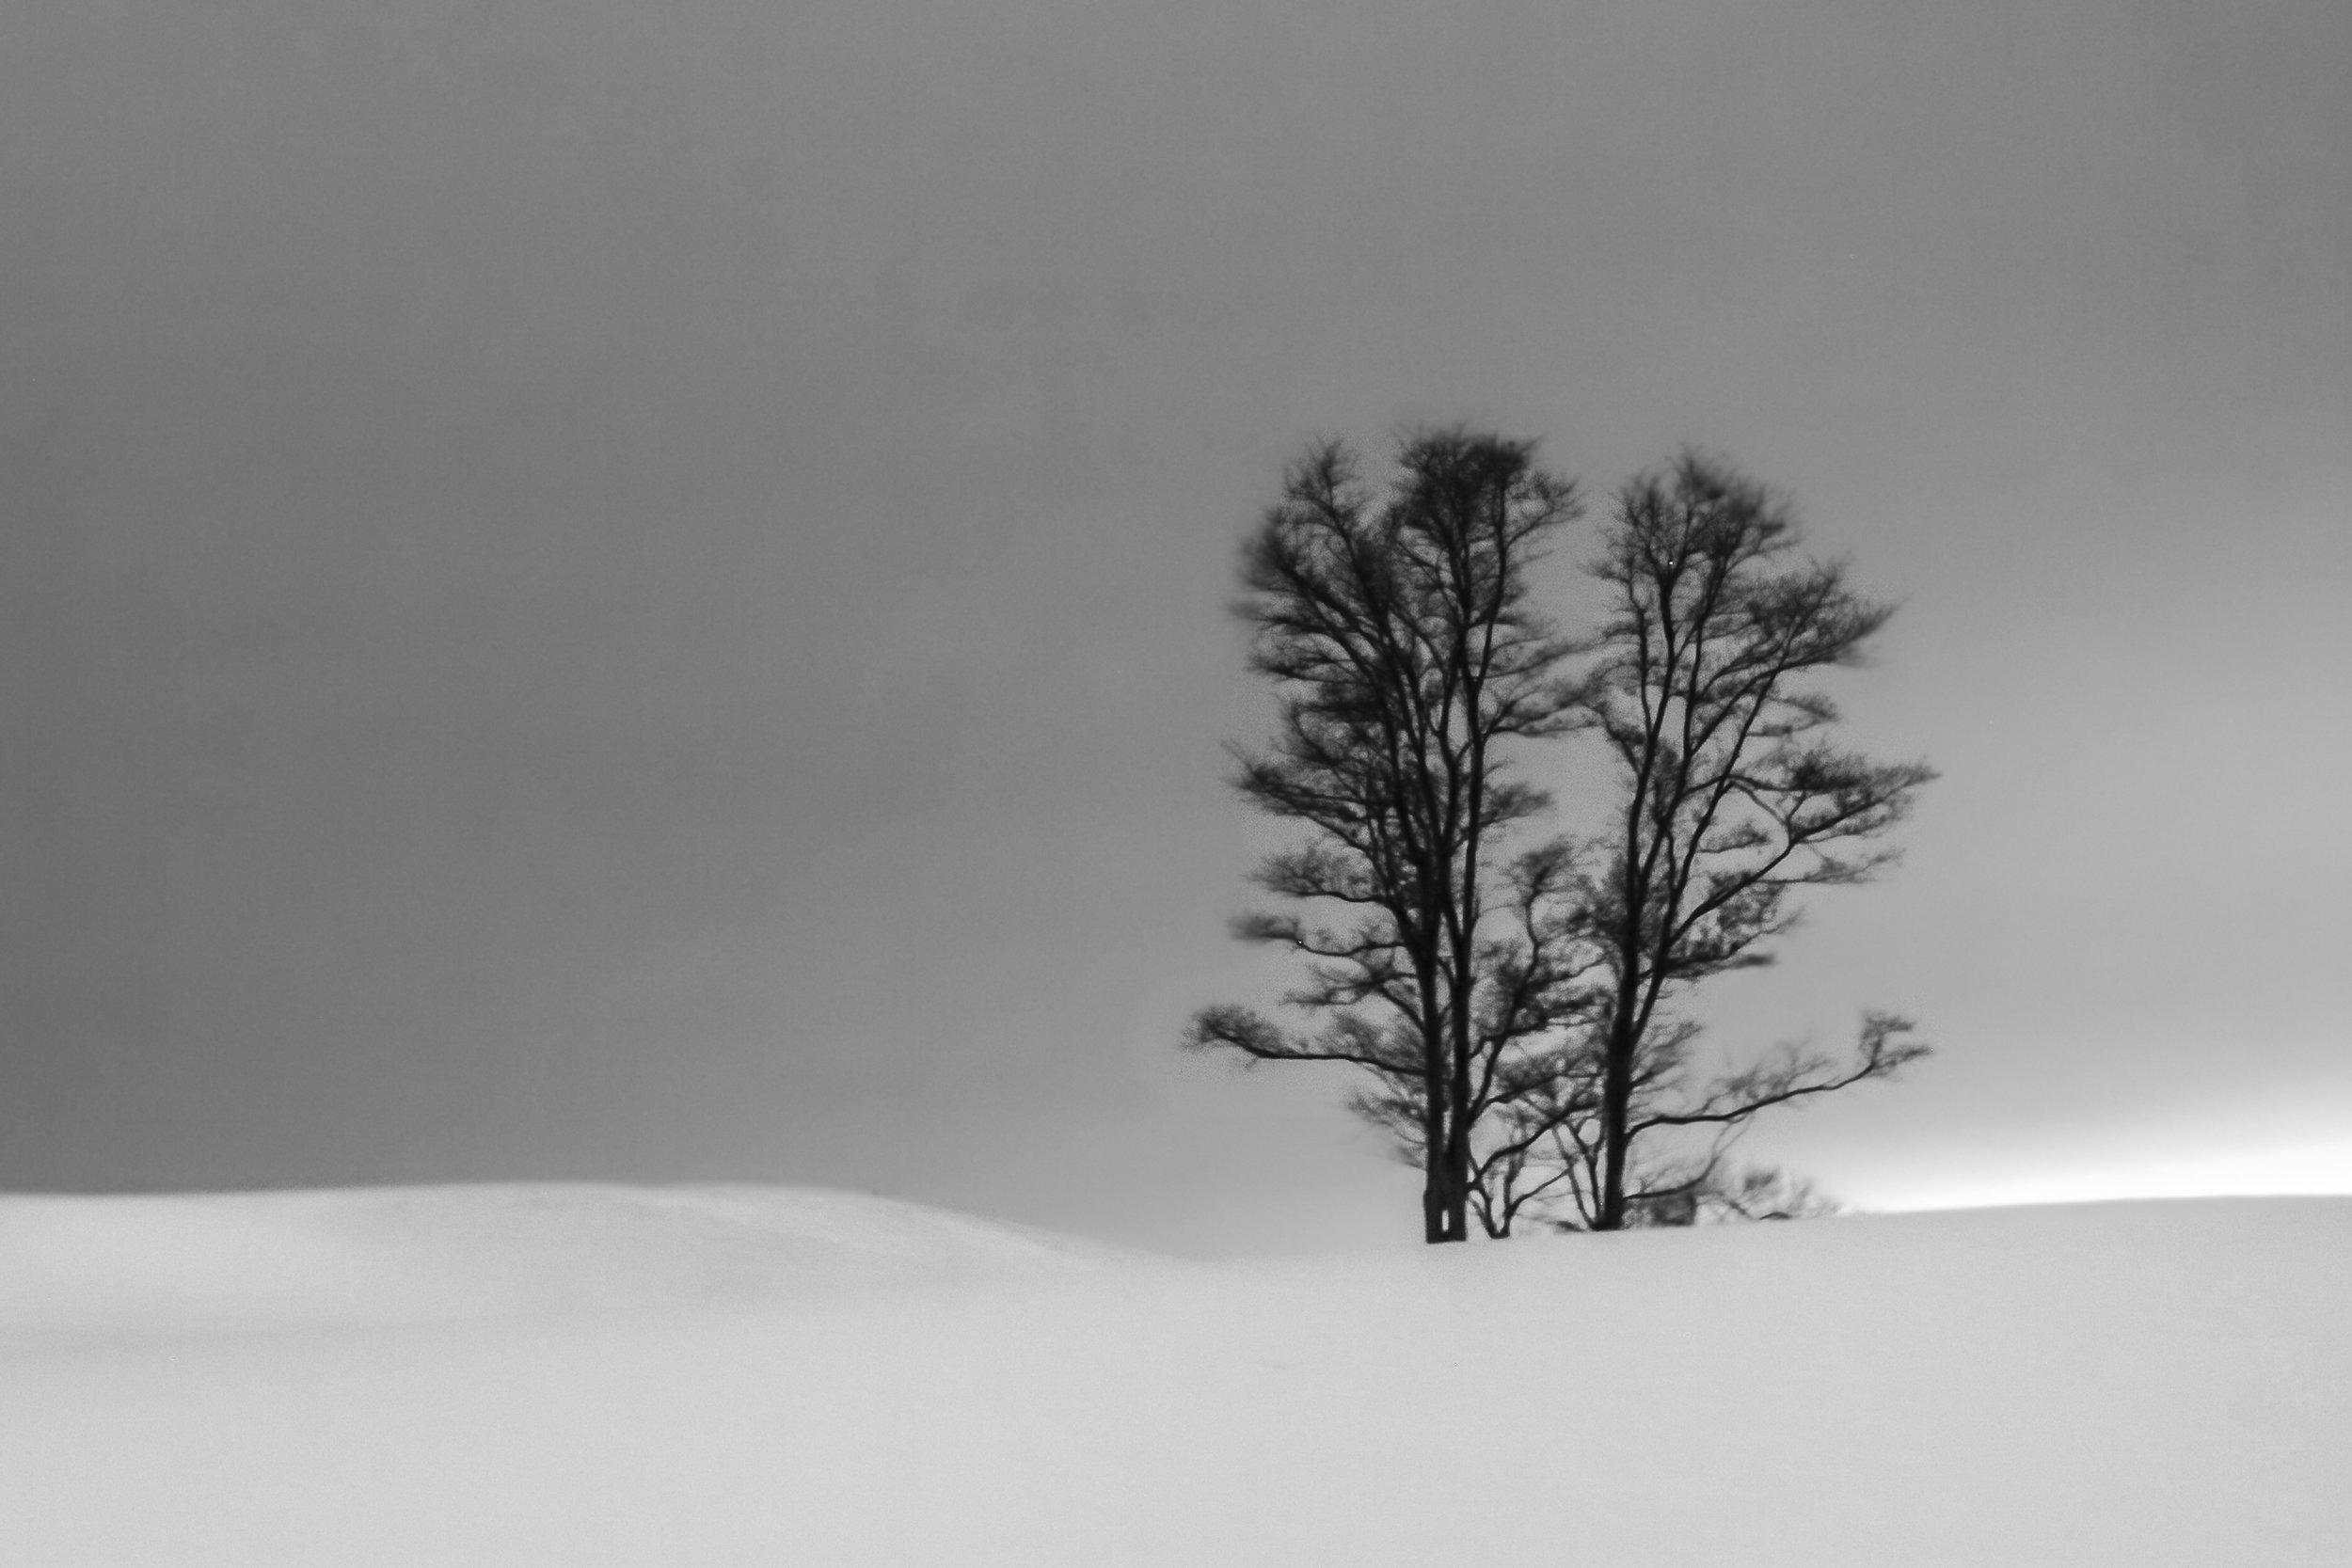 untitled shoot-8294.jpg